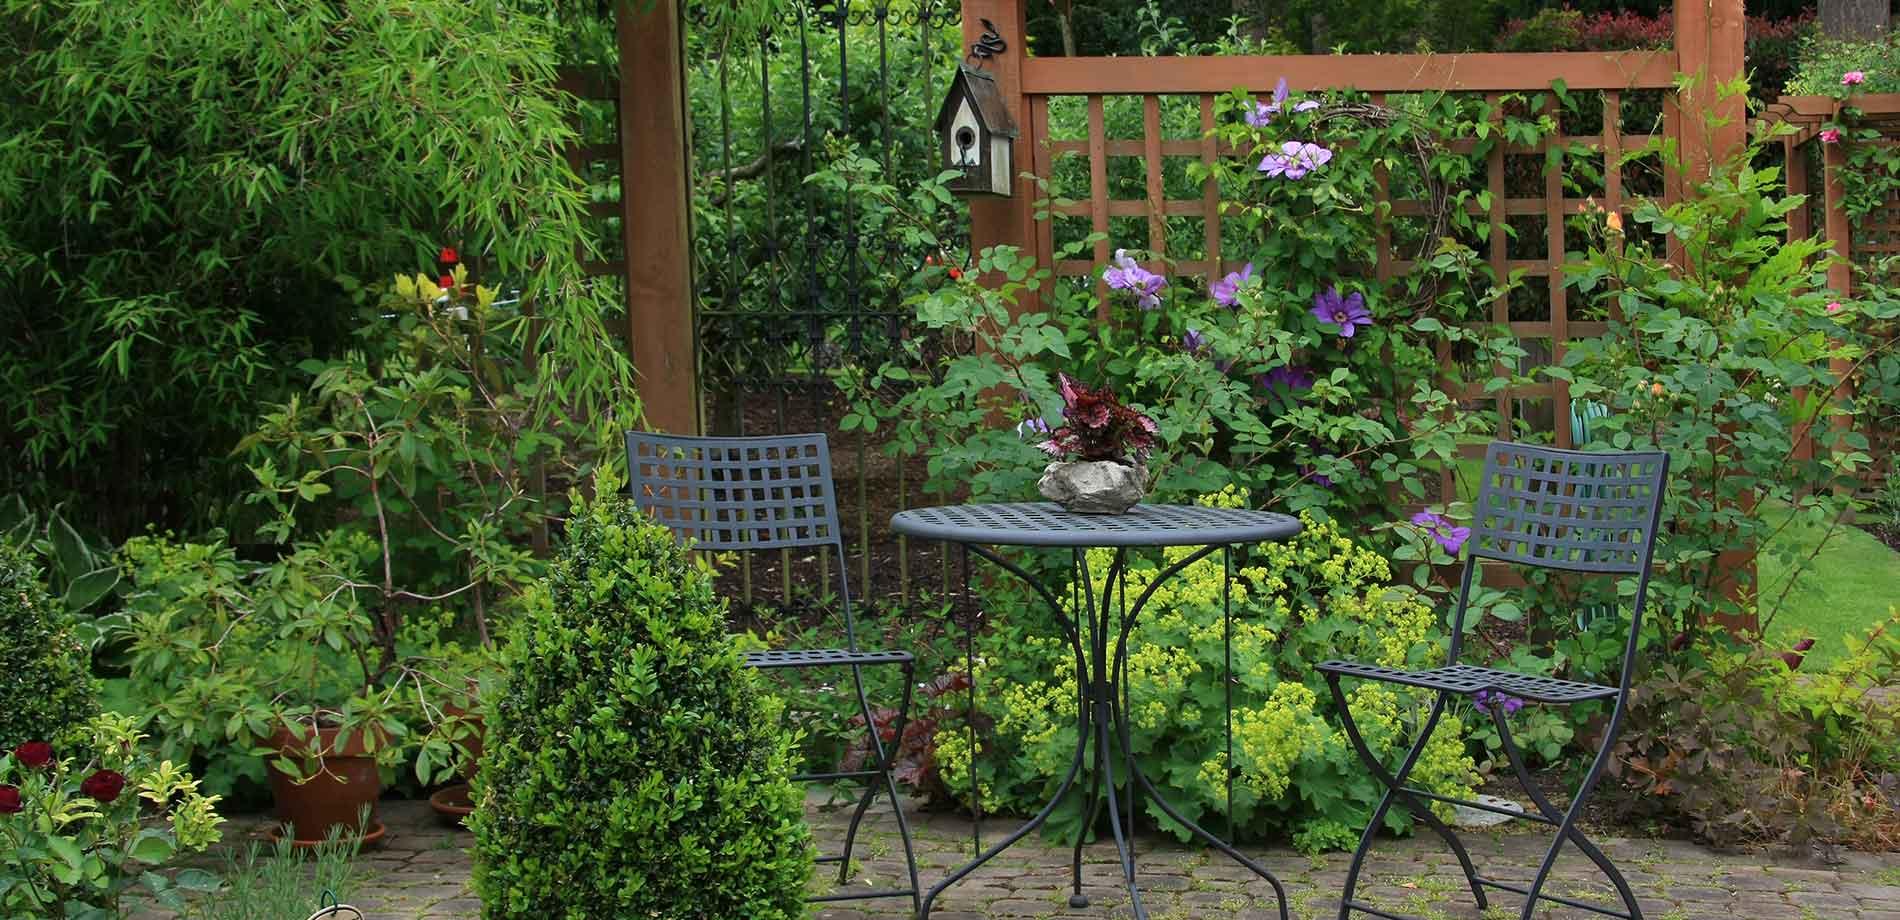 Athens Design Yard: Landscaping, Tree Care, Irrigation & Garden Center